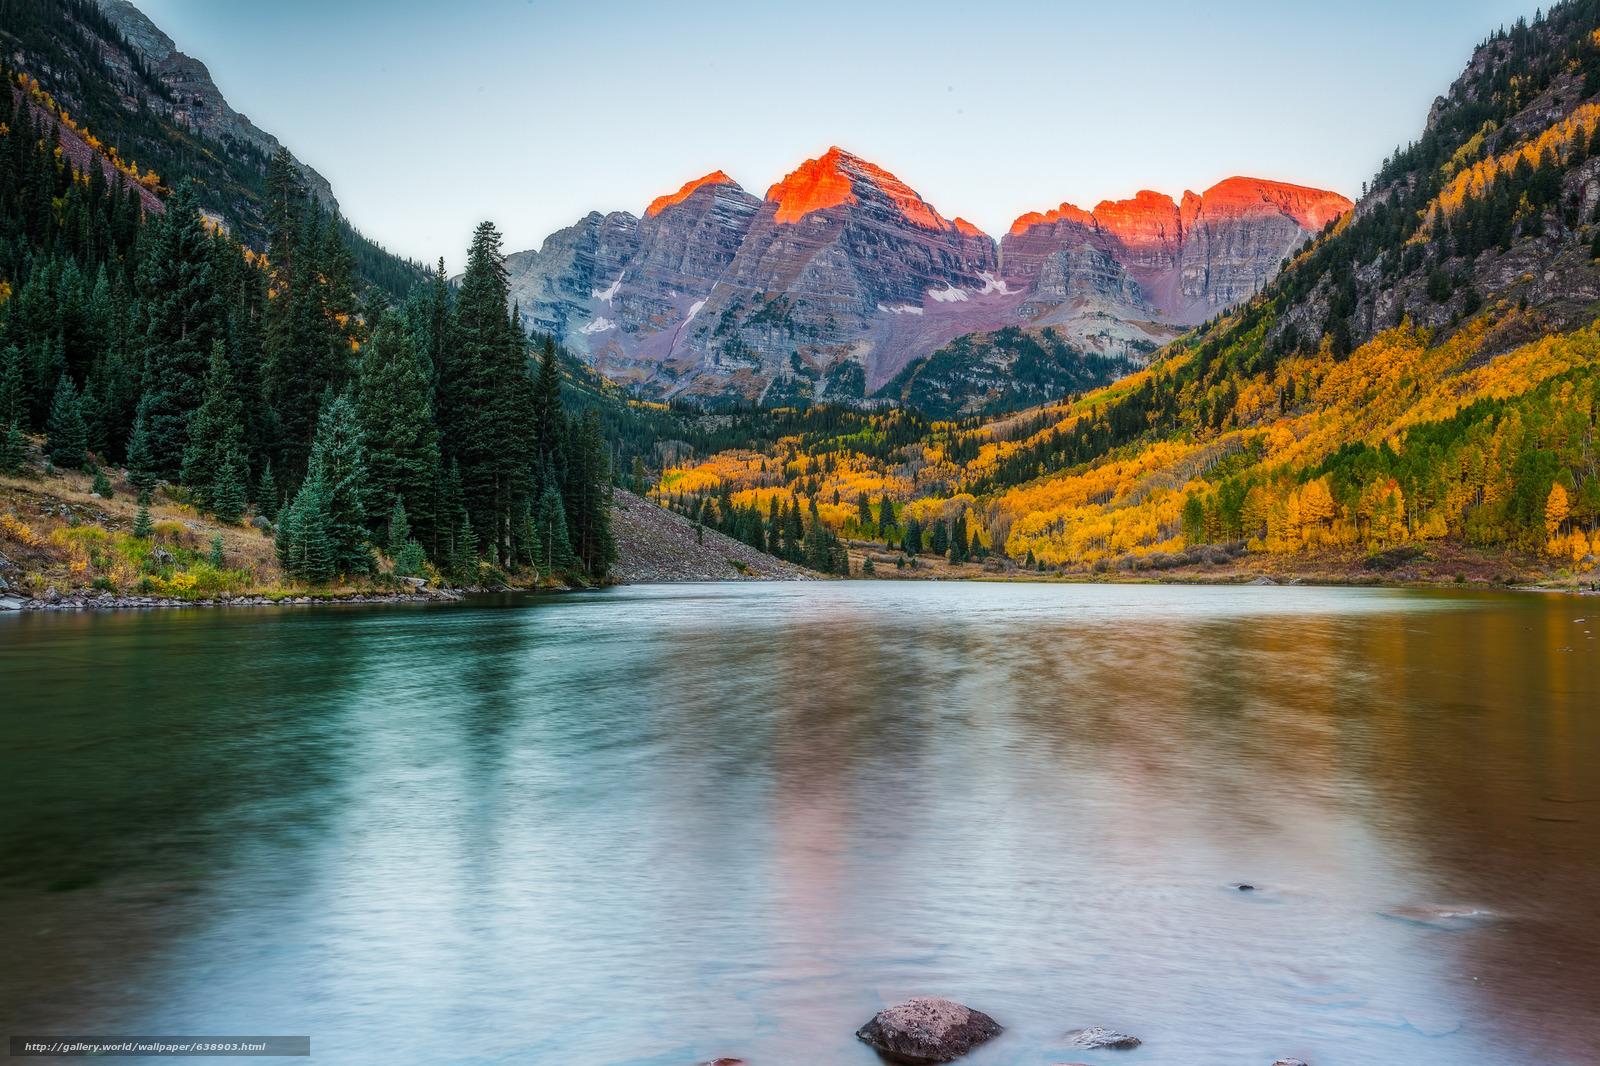 Download wallpaper : Maroon Bells,  Colorado.ozero,  Mountains,  trees free desktop wallpaper in the resolution 2048x1365 — picture №638903